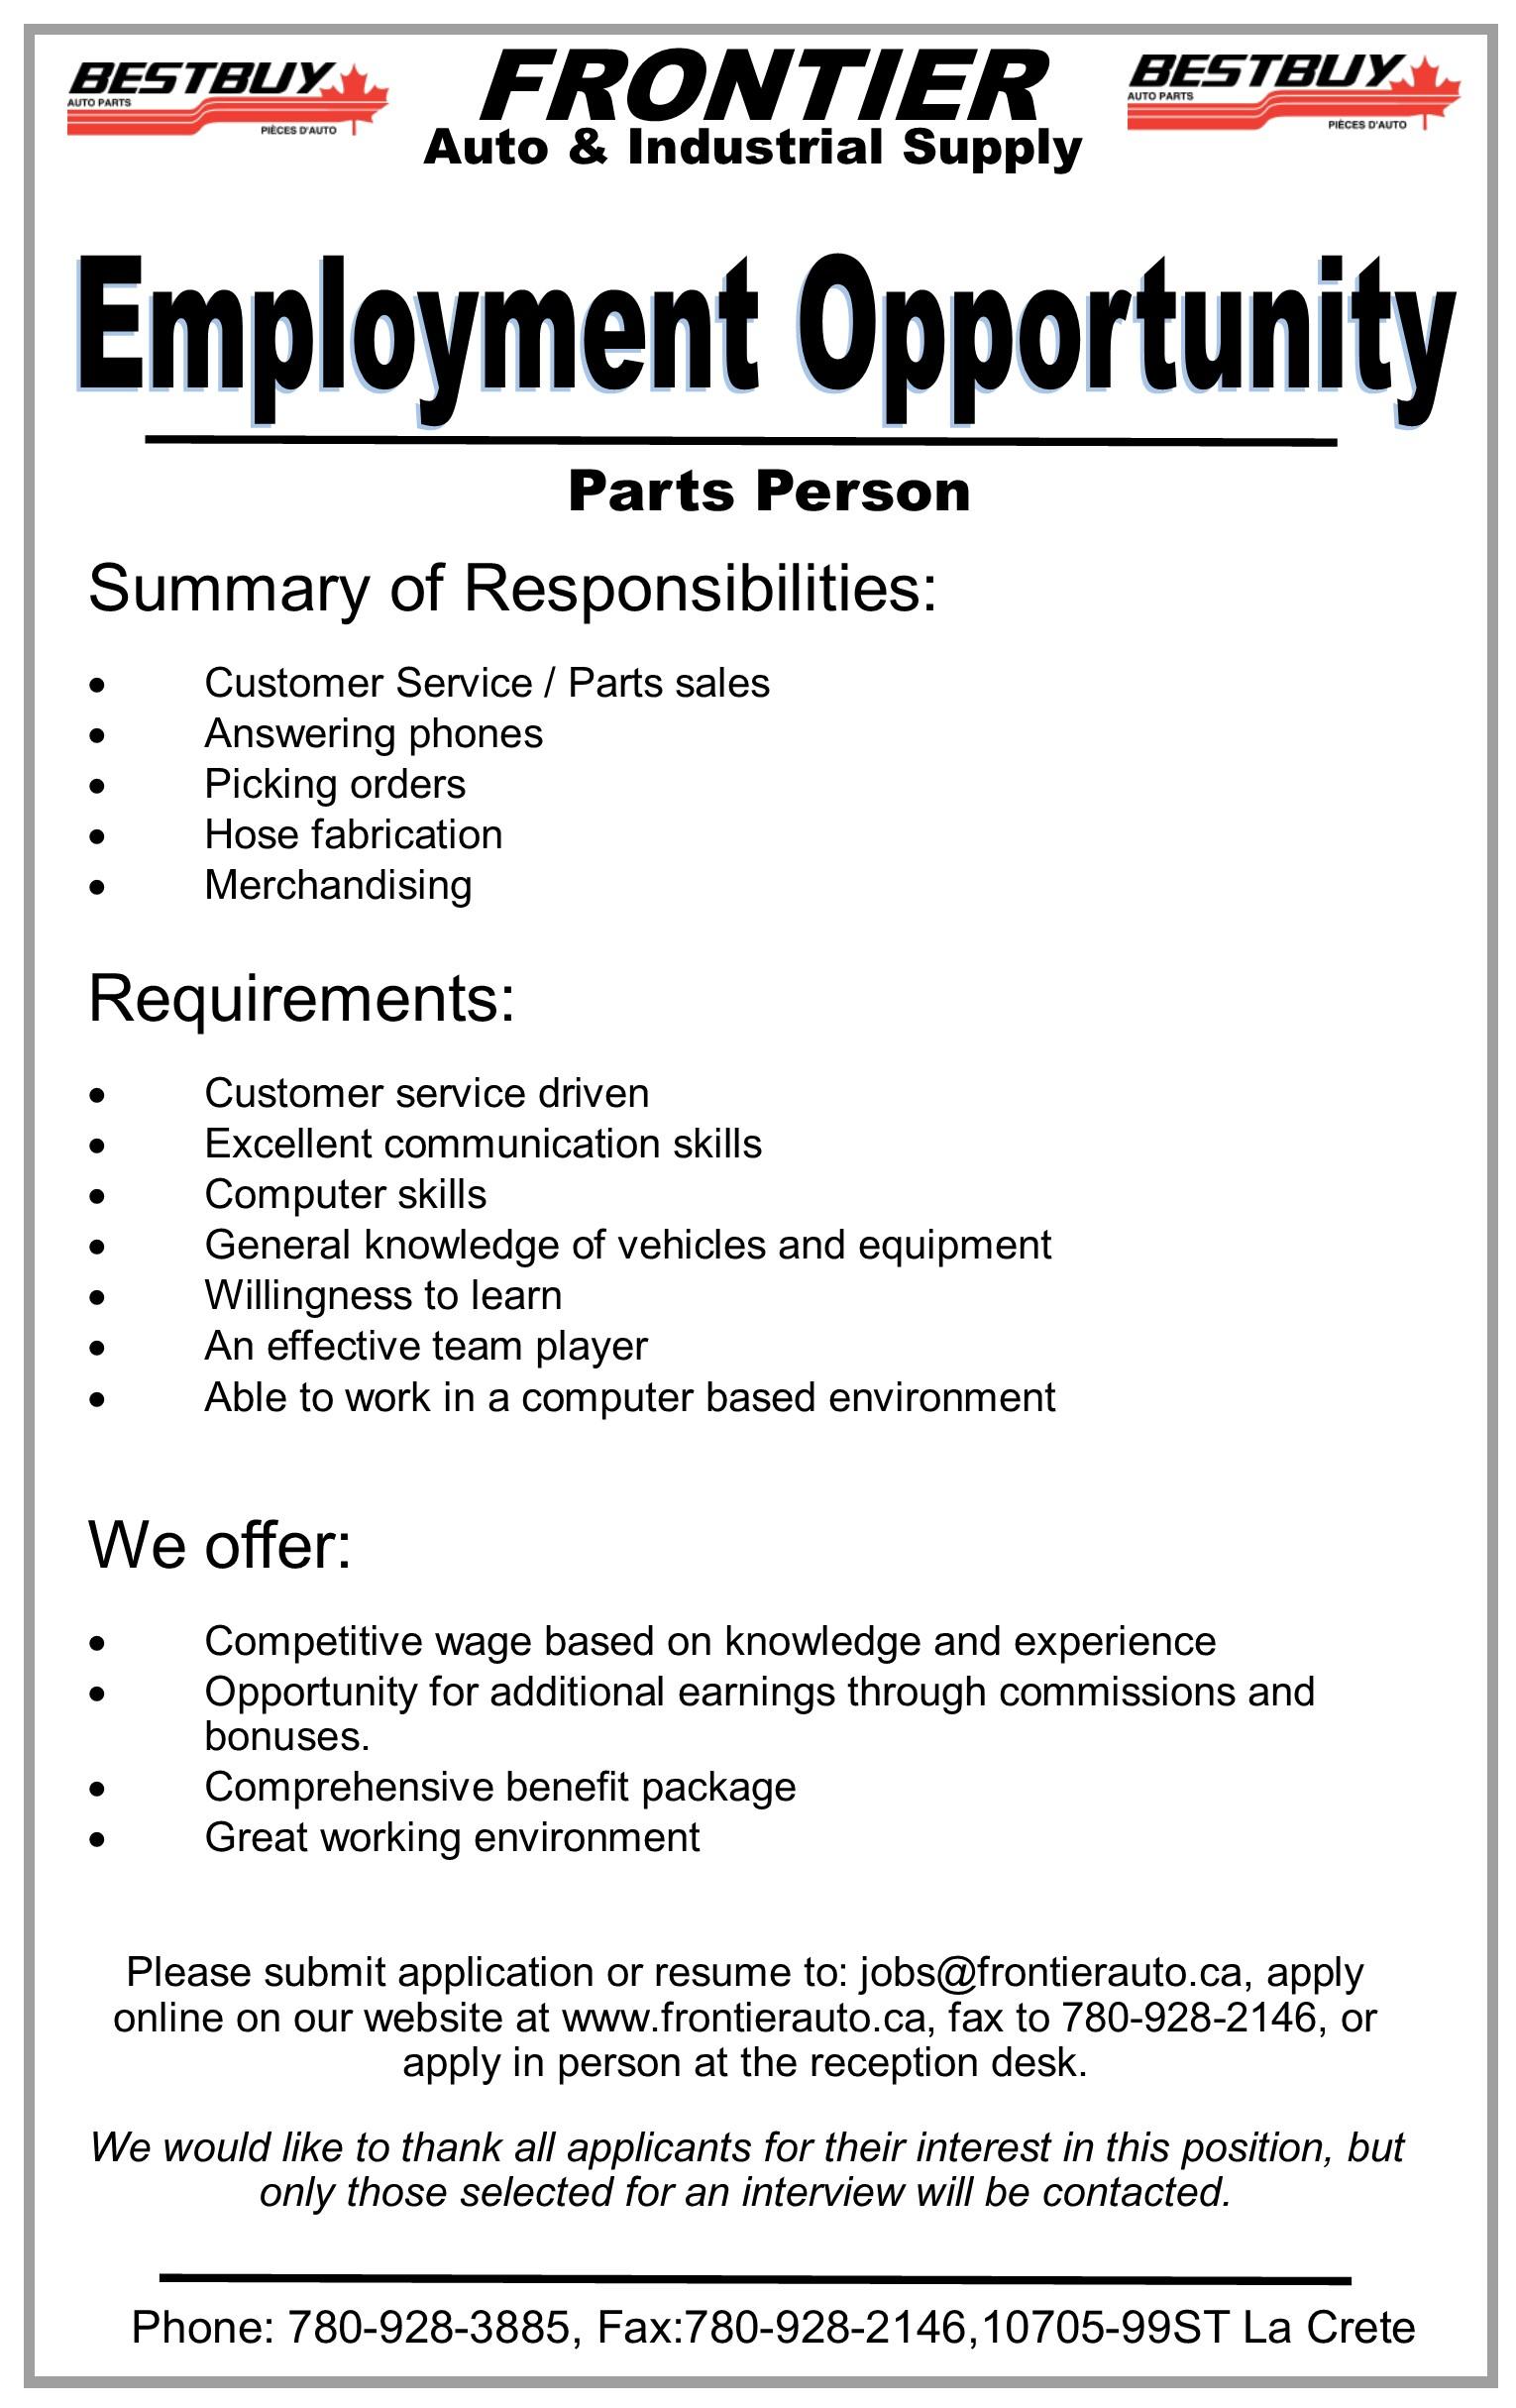 Employment Ad-Frontier Auto-Parts Person-June 23, 2017